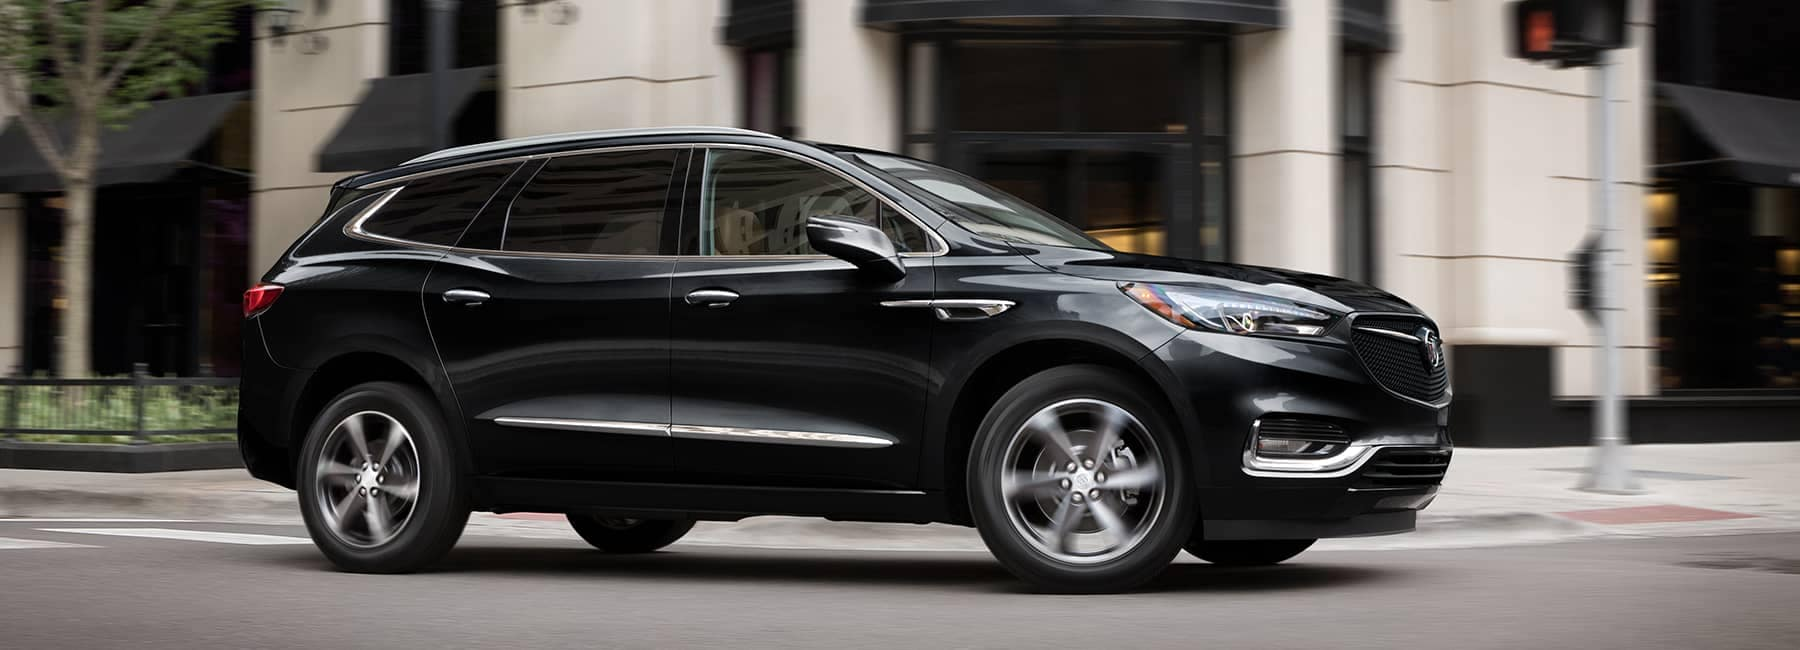 Black 2020 Buick Enclave turns city corner